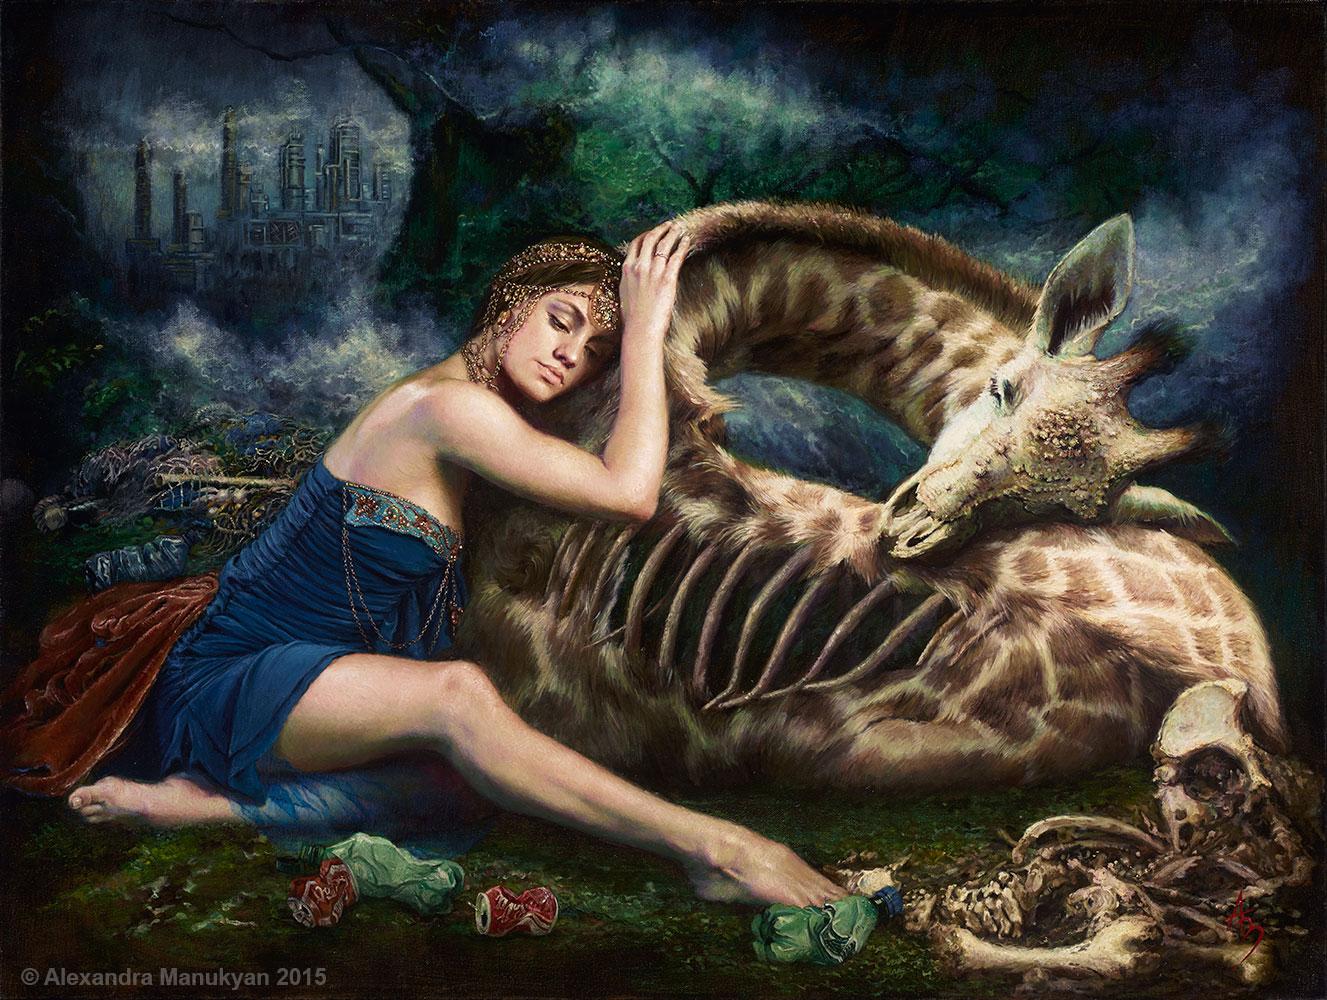 Alexandra Manukyan |Surrealist Painter